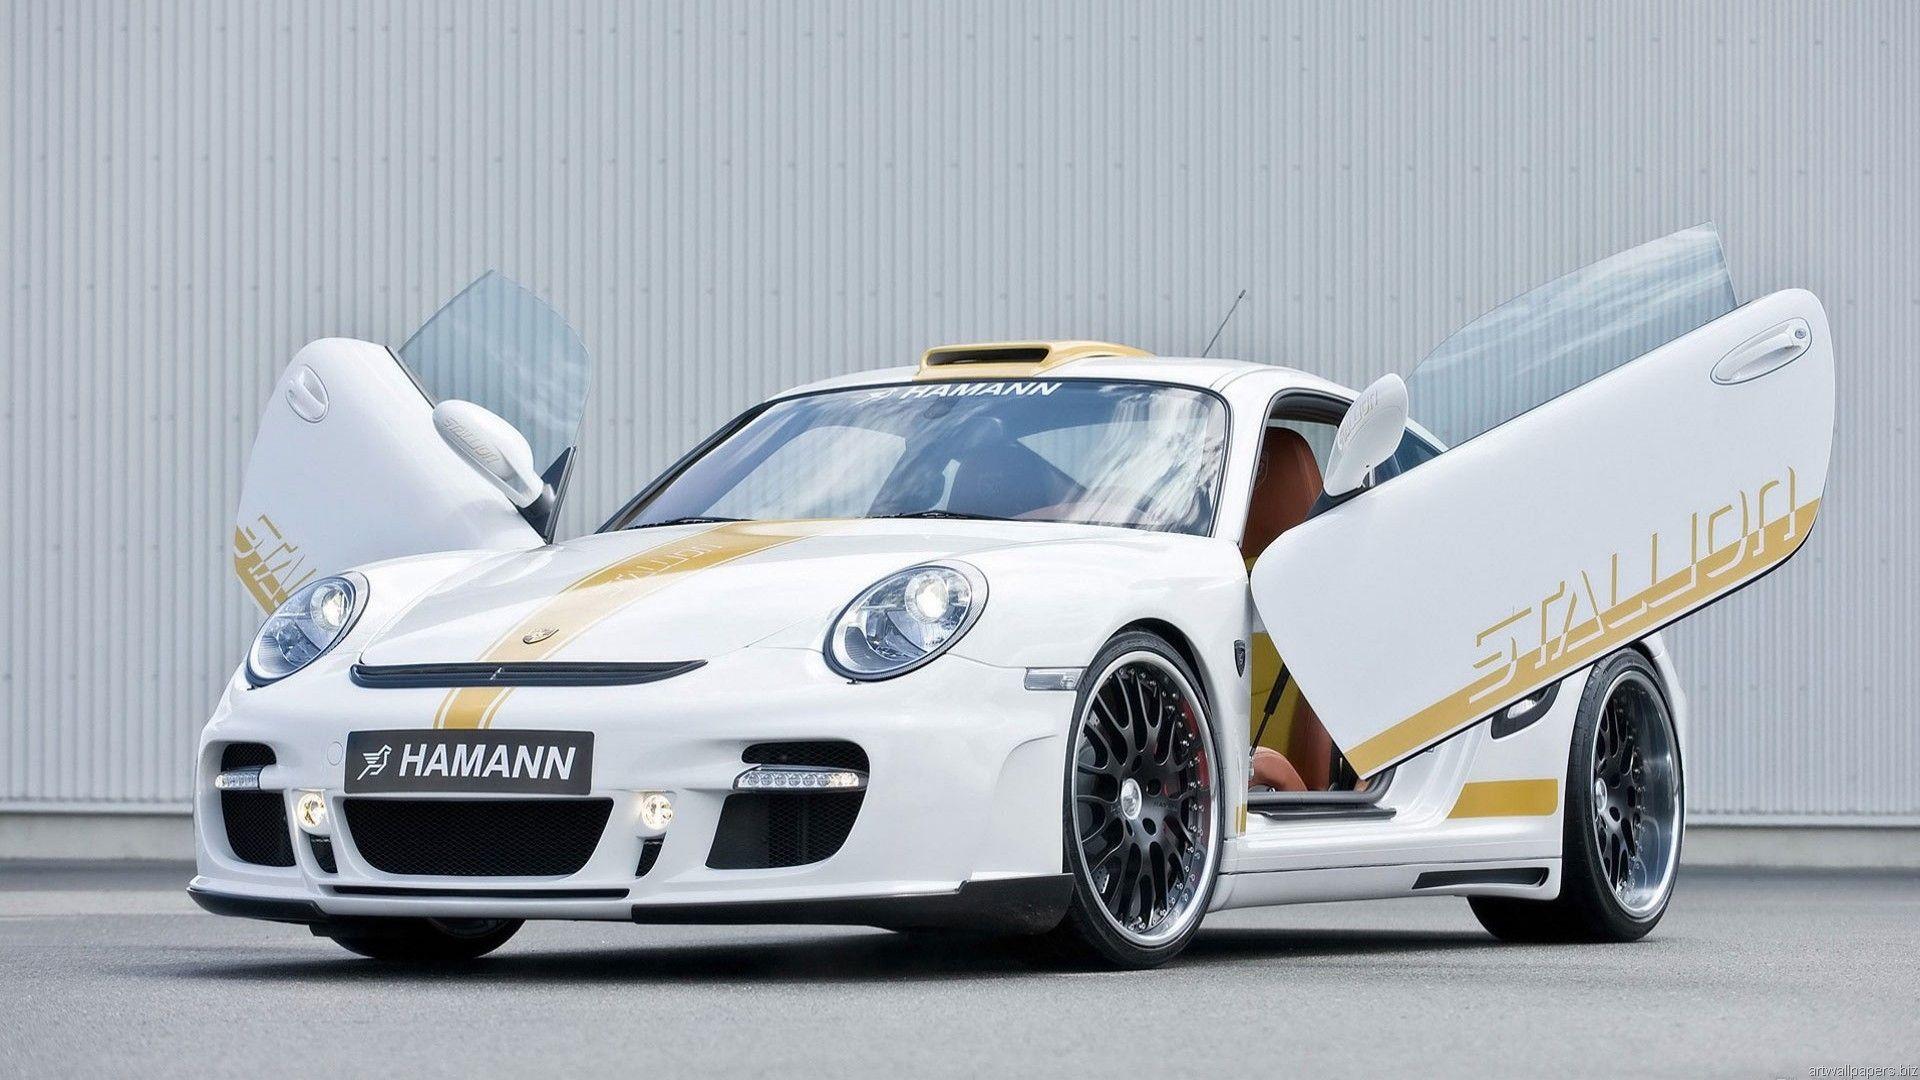 PORSCHE CARS  WALLPAPER  | Porsche Cars Wallpaper, Porsche Cars HDTV Wallpapers HD